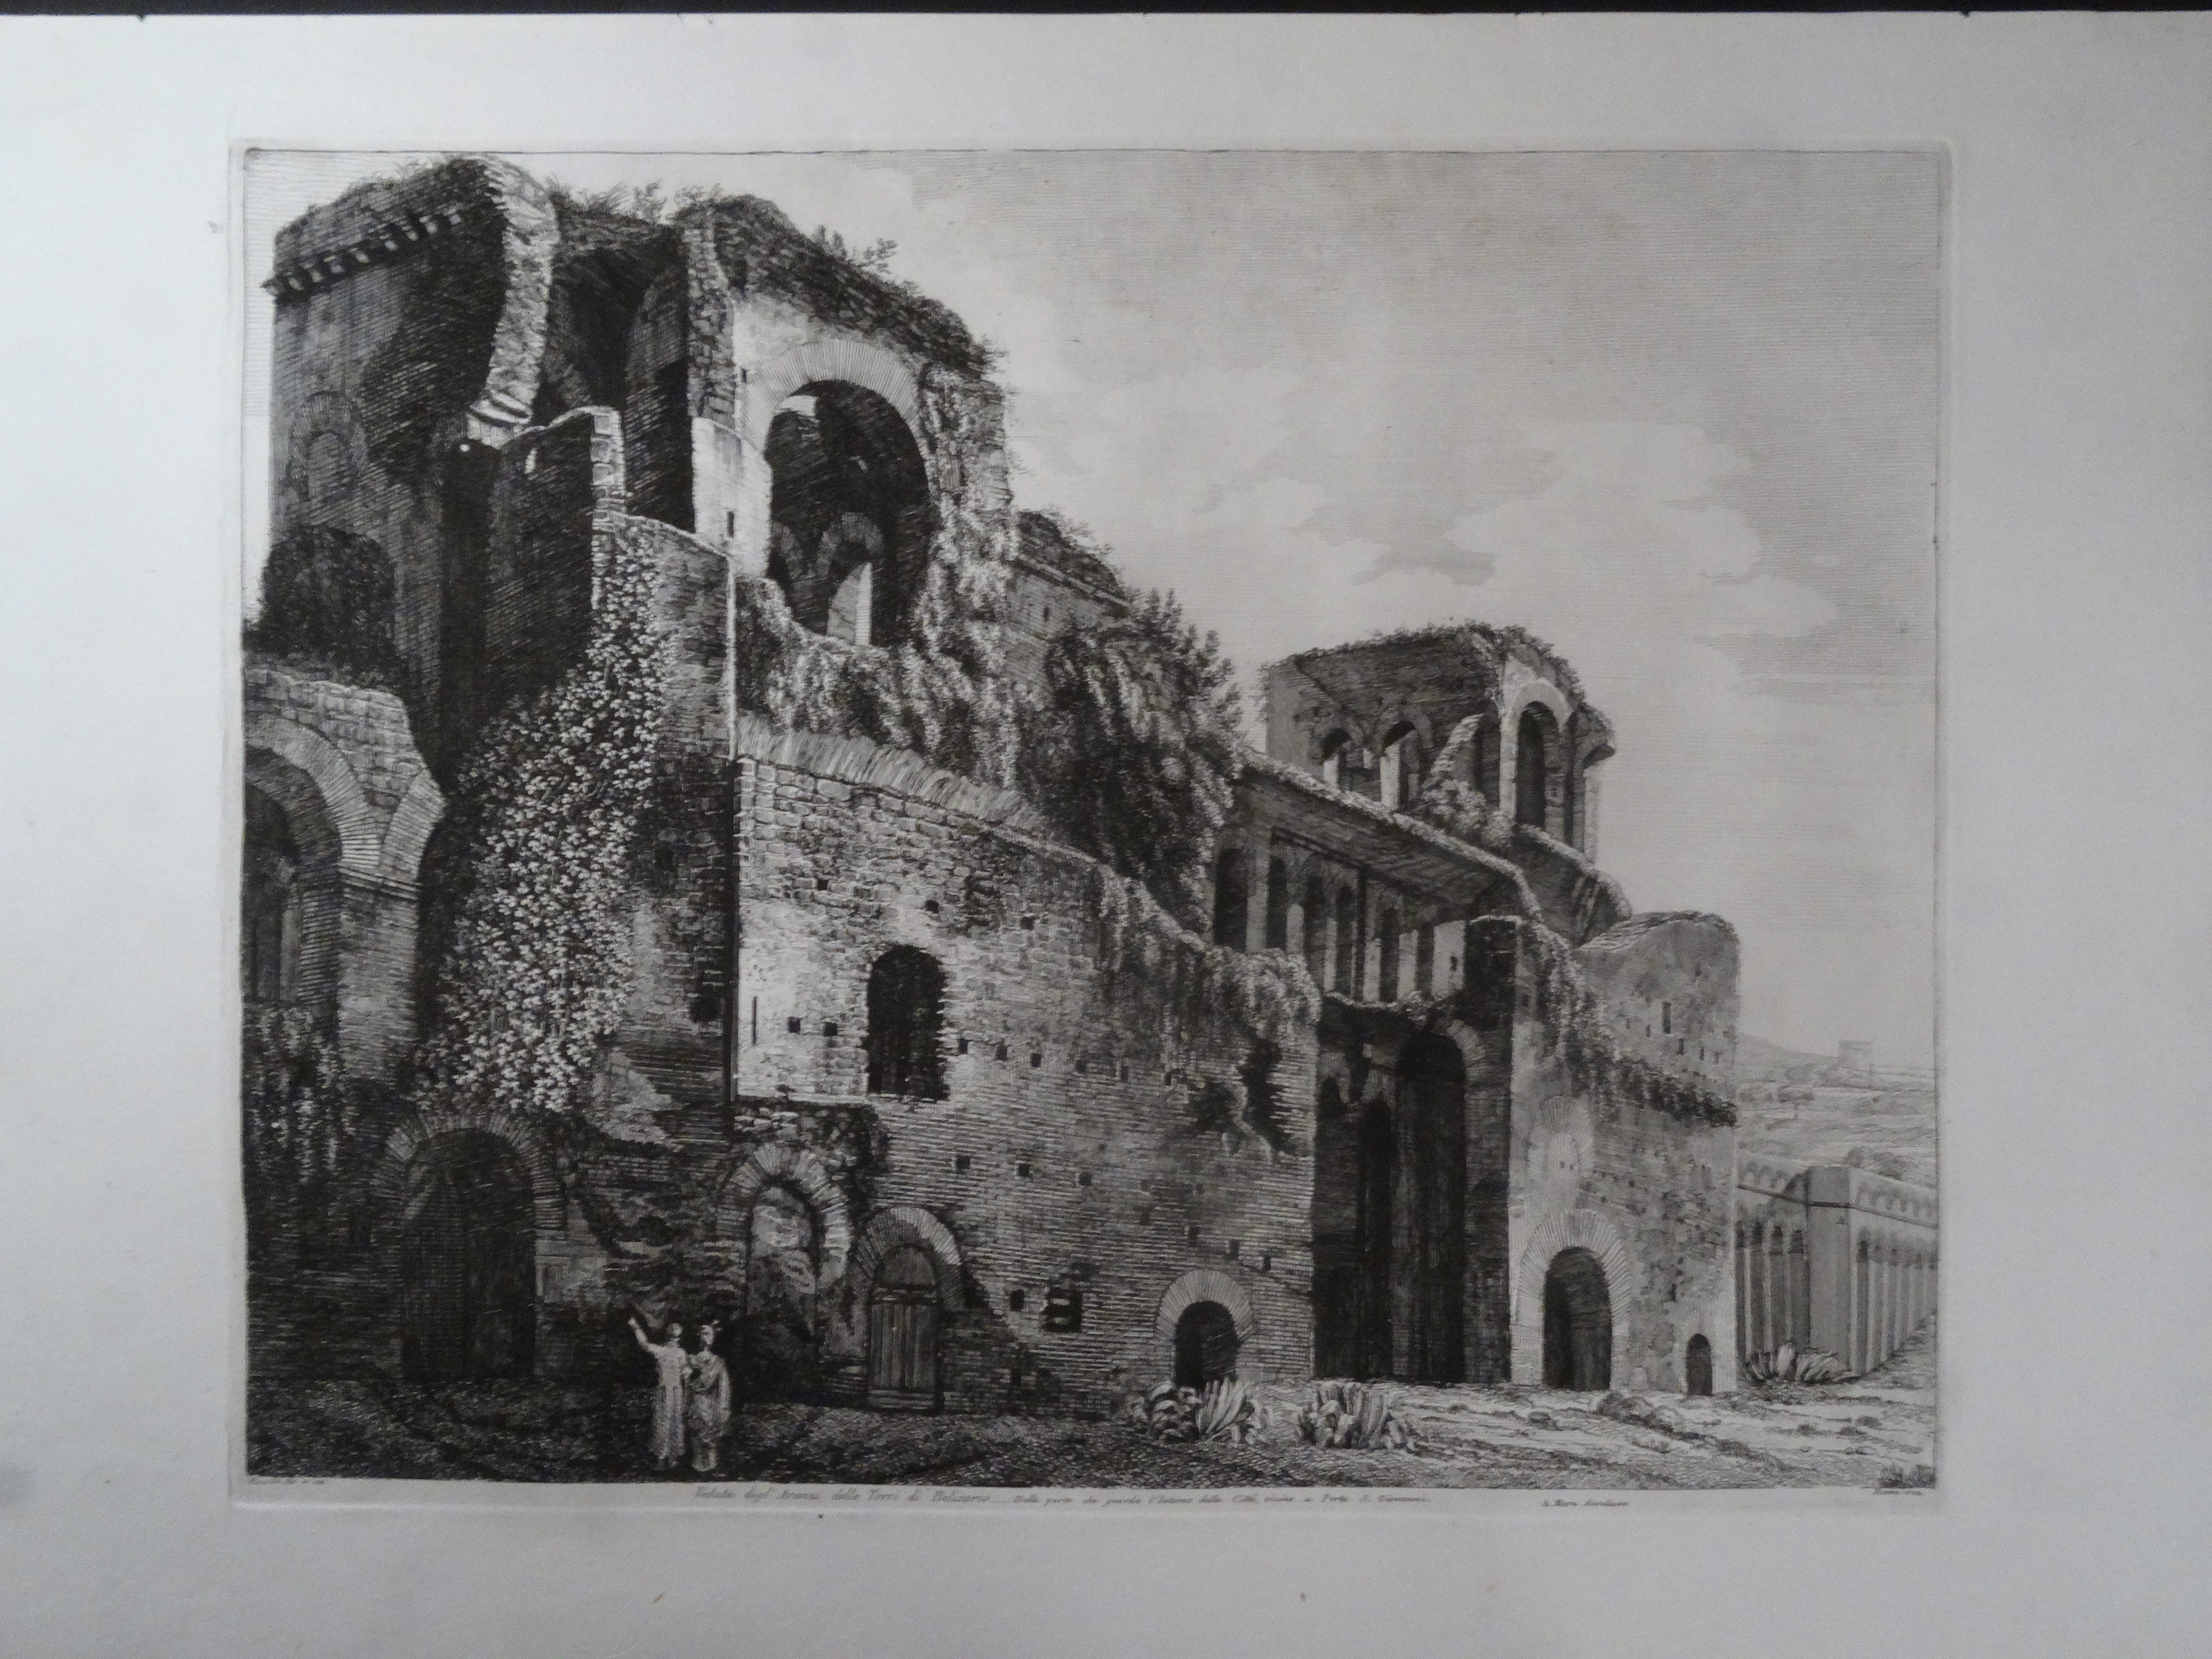 Tori de Belisario, Roma 1822